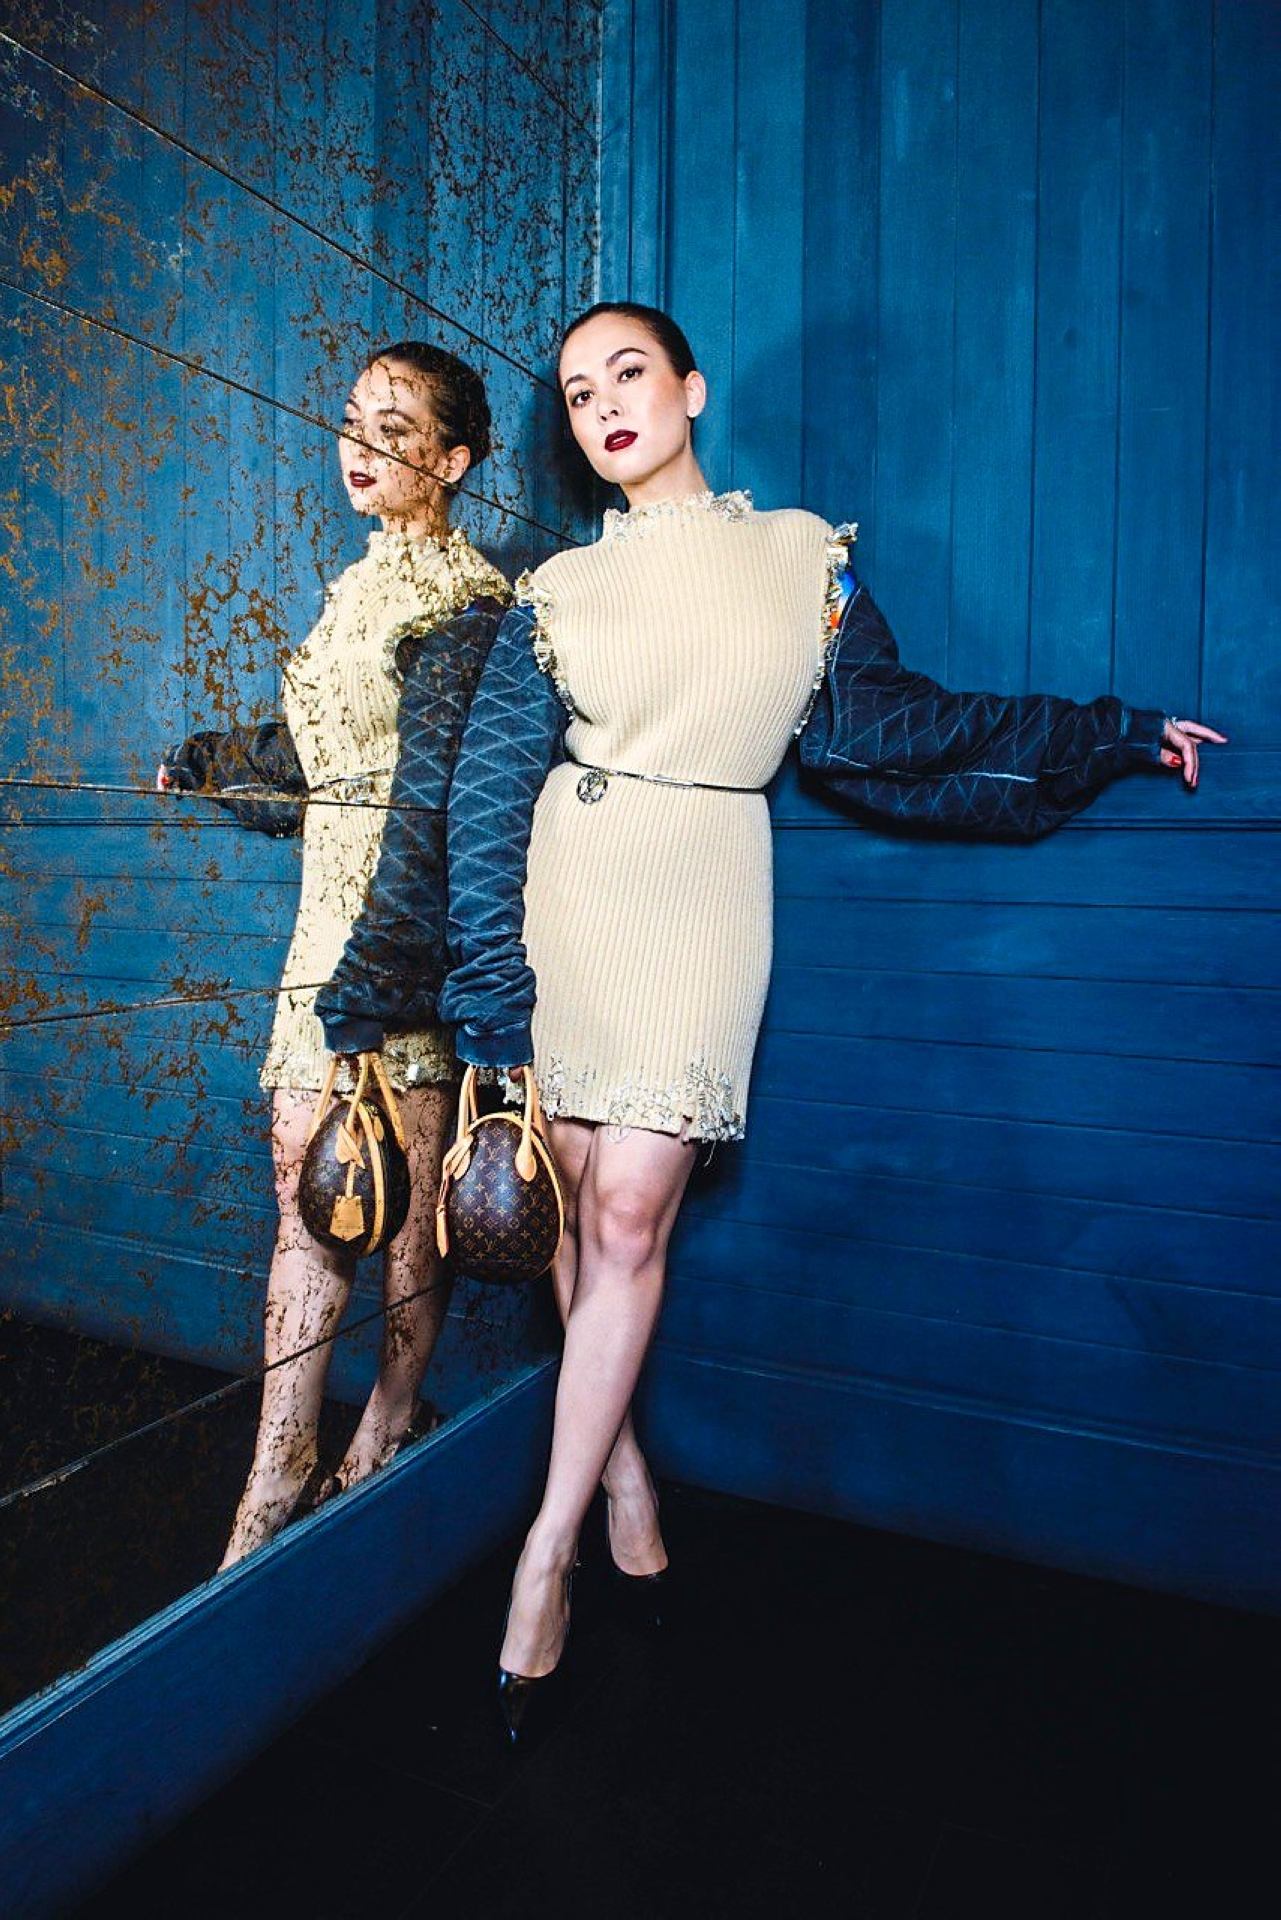 Saleha endorses L'Oreal Paris' skincare range. — SITI SALEHA